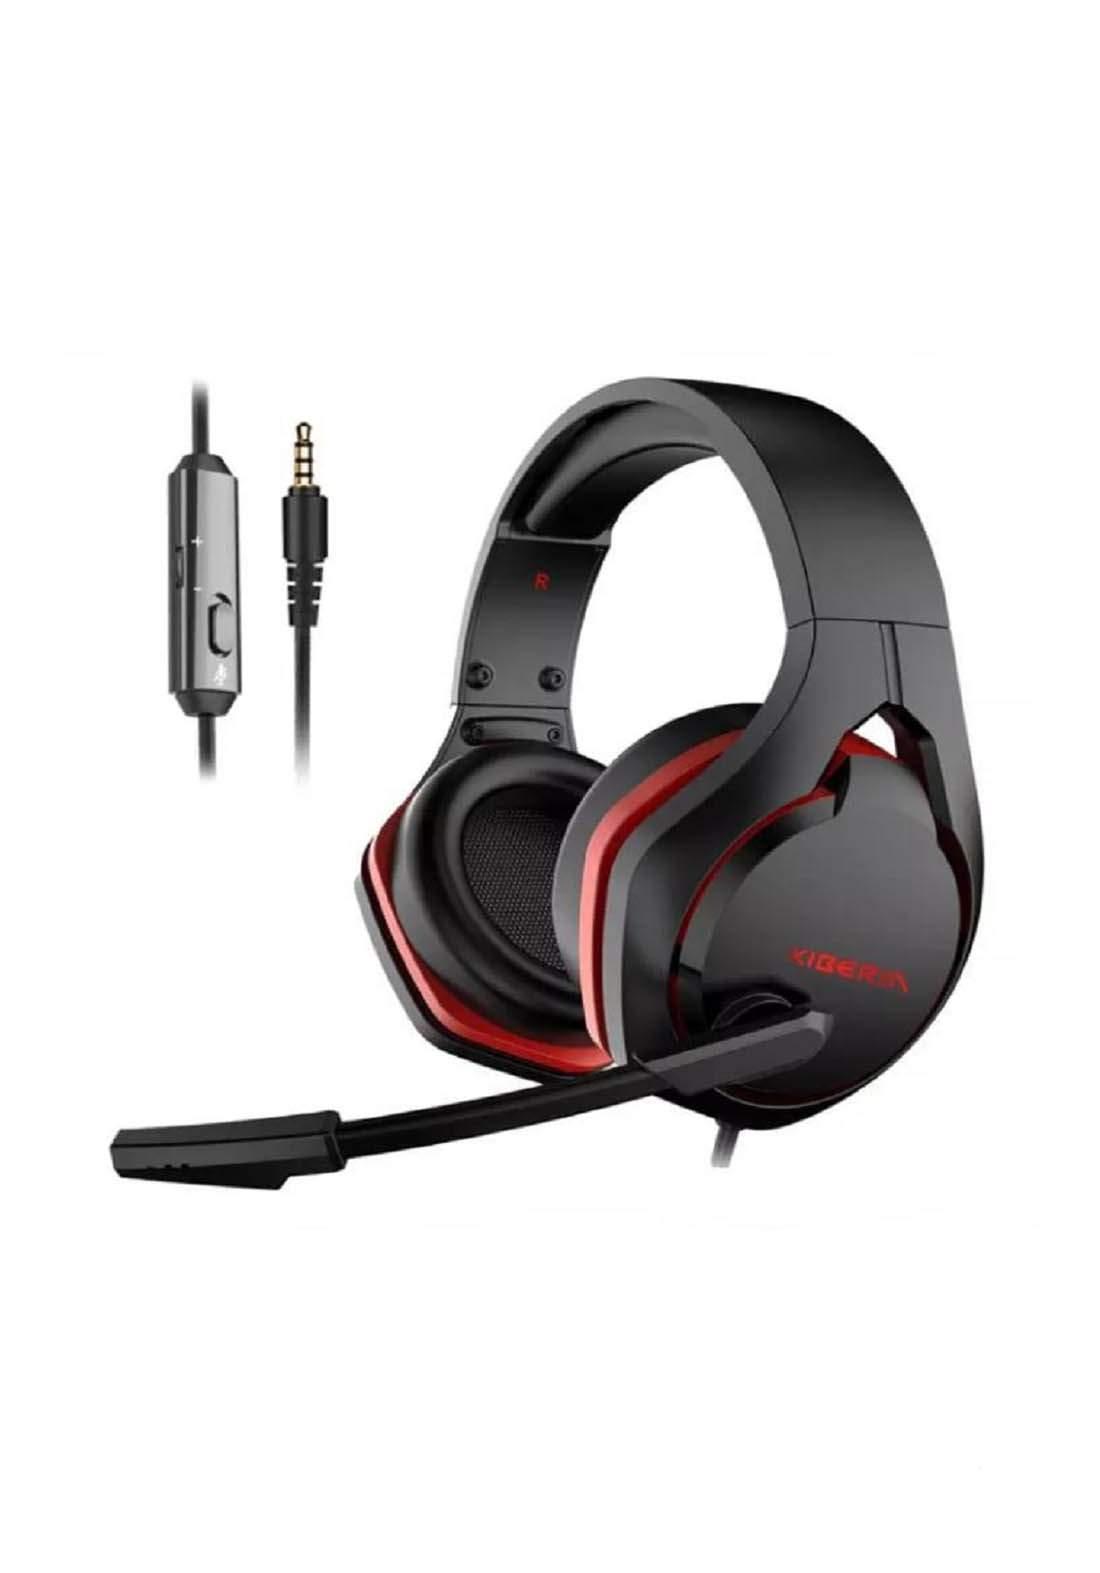 Xiberia V22 Gaming Headset for PC - Black سماعة